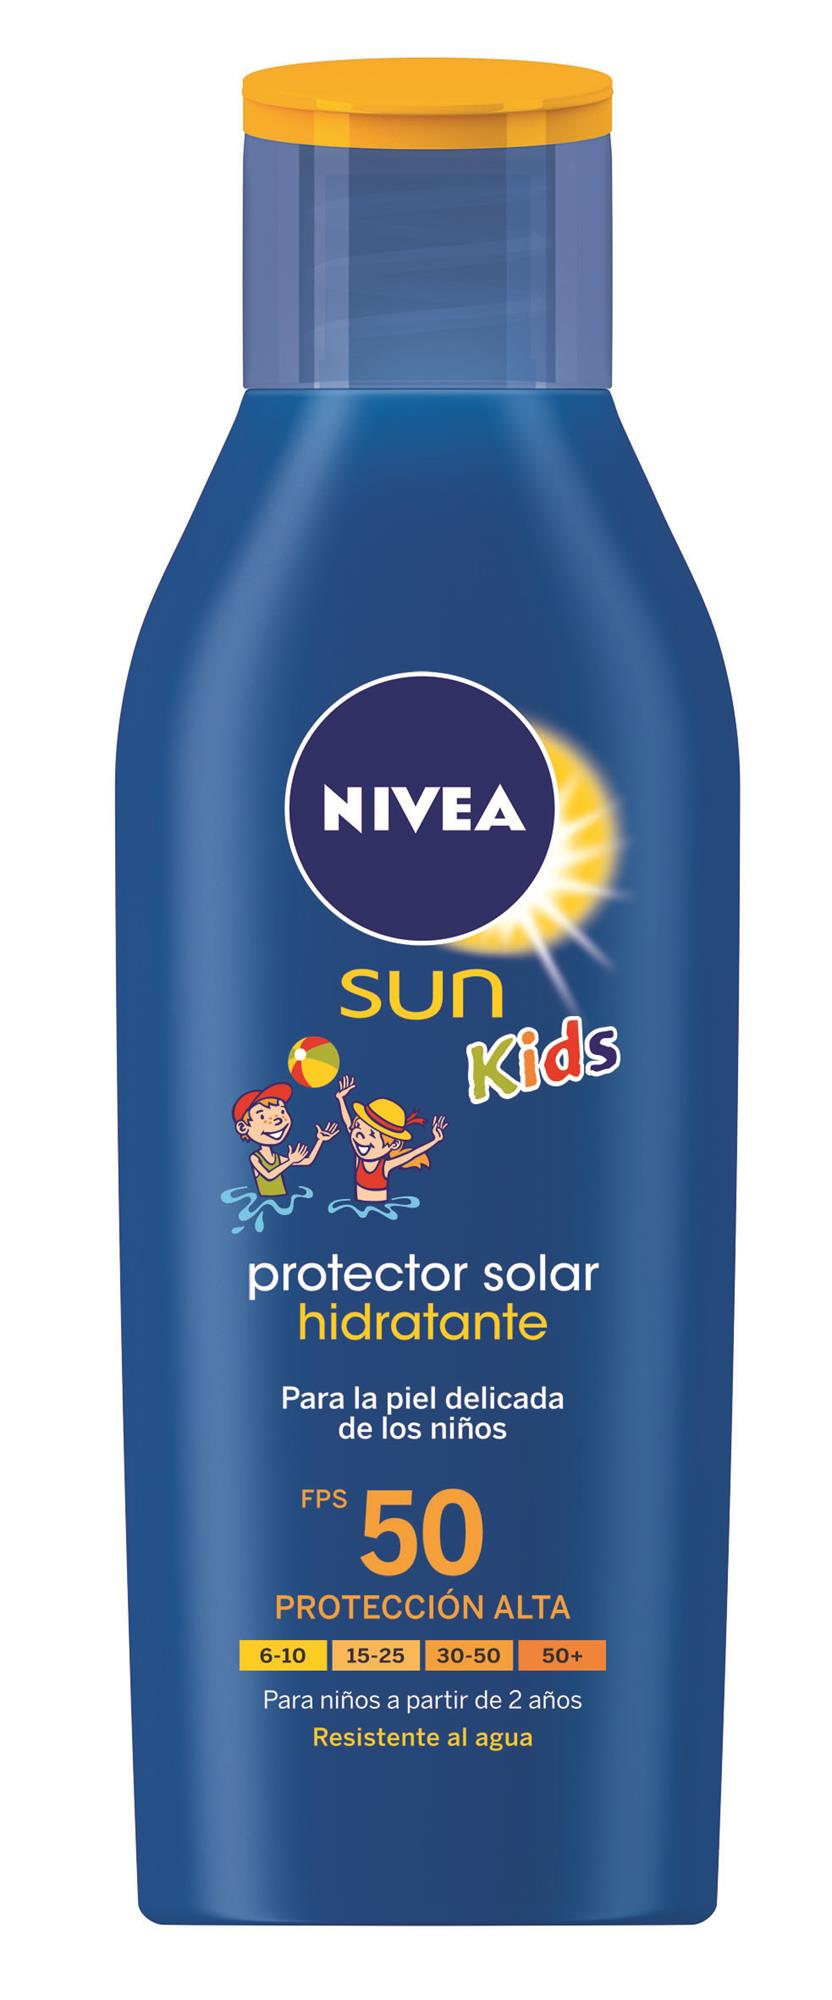 PROTECTOR SOLAR HIDRATANTE 200ML FPS 50 NIVEA SUN KIDS FRASCO